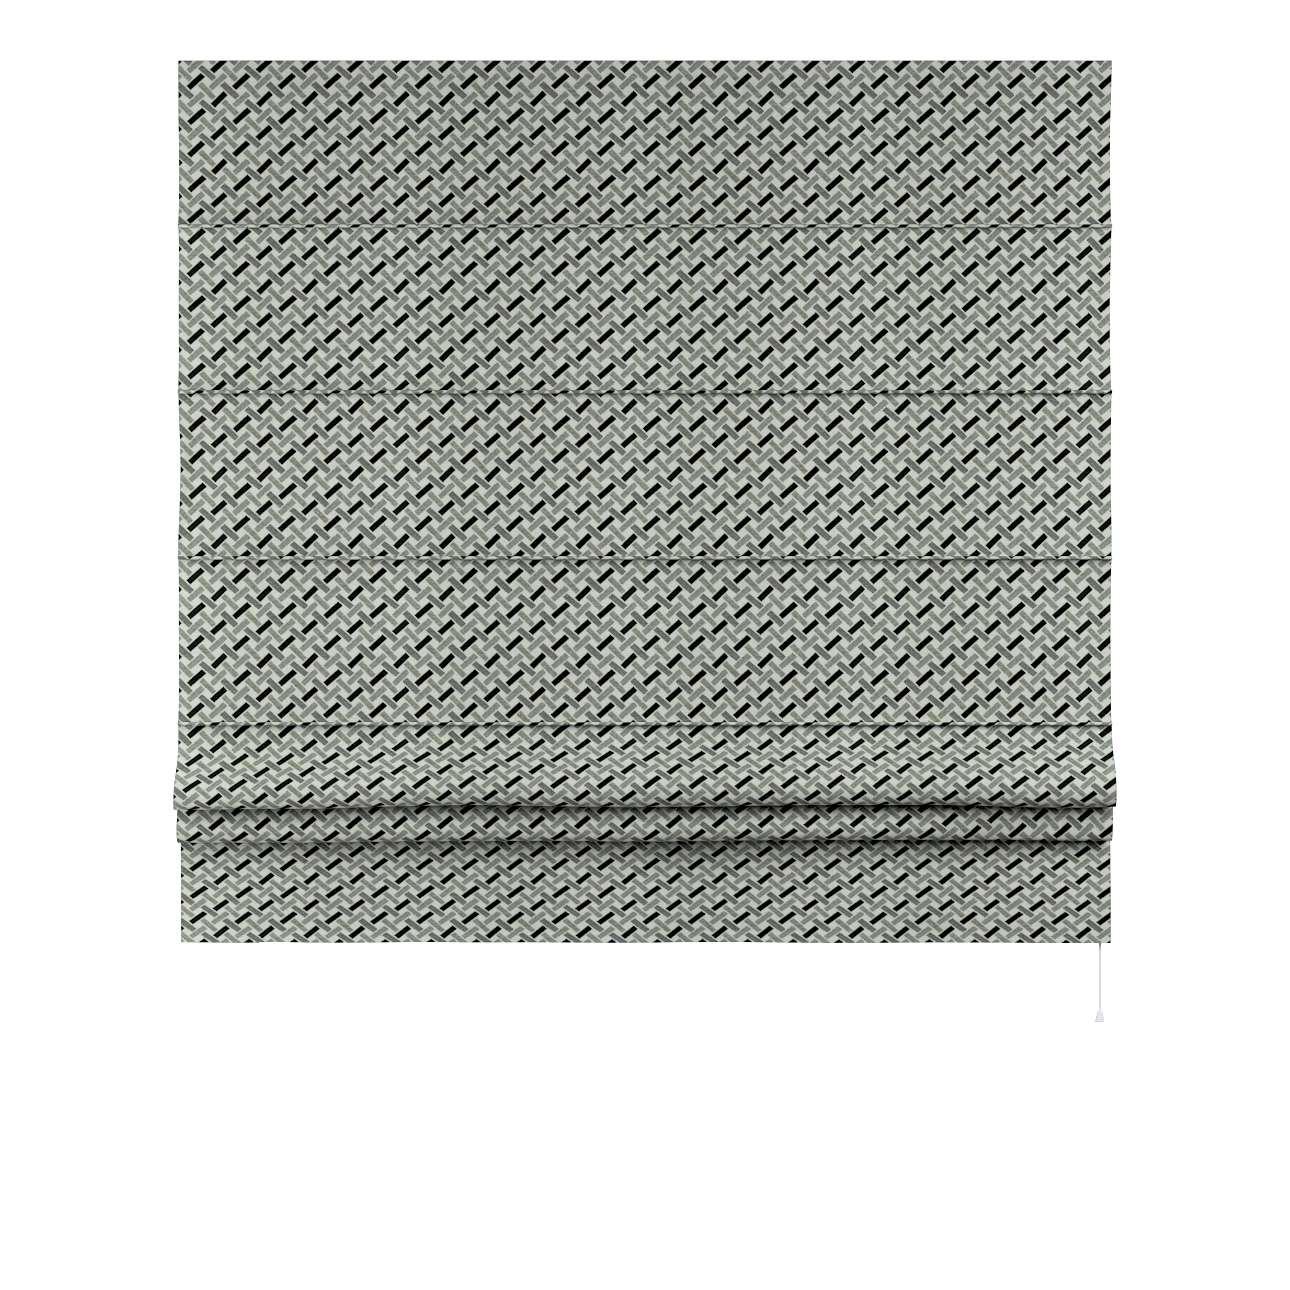 Rímska roleta Padva V kolekcii Black & White, tkanina: 142-78